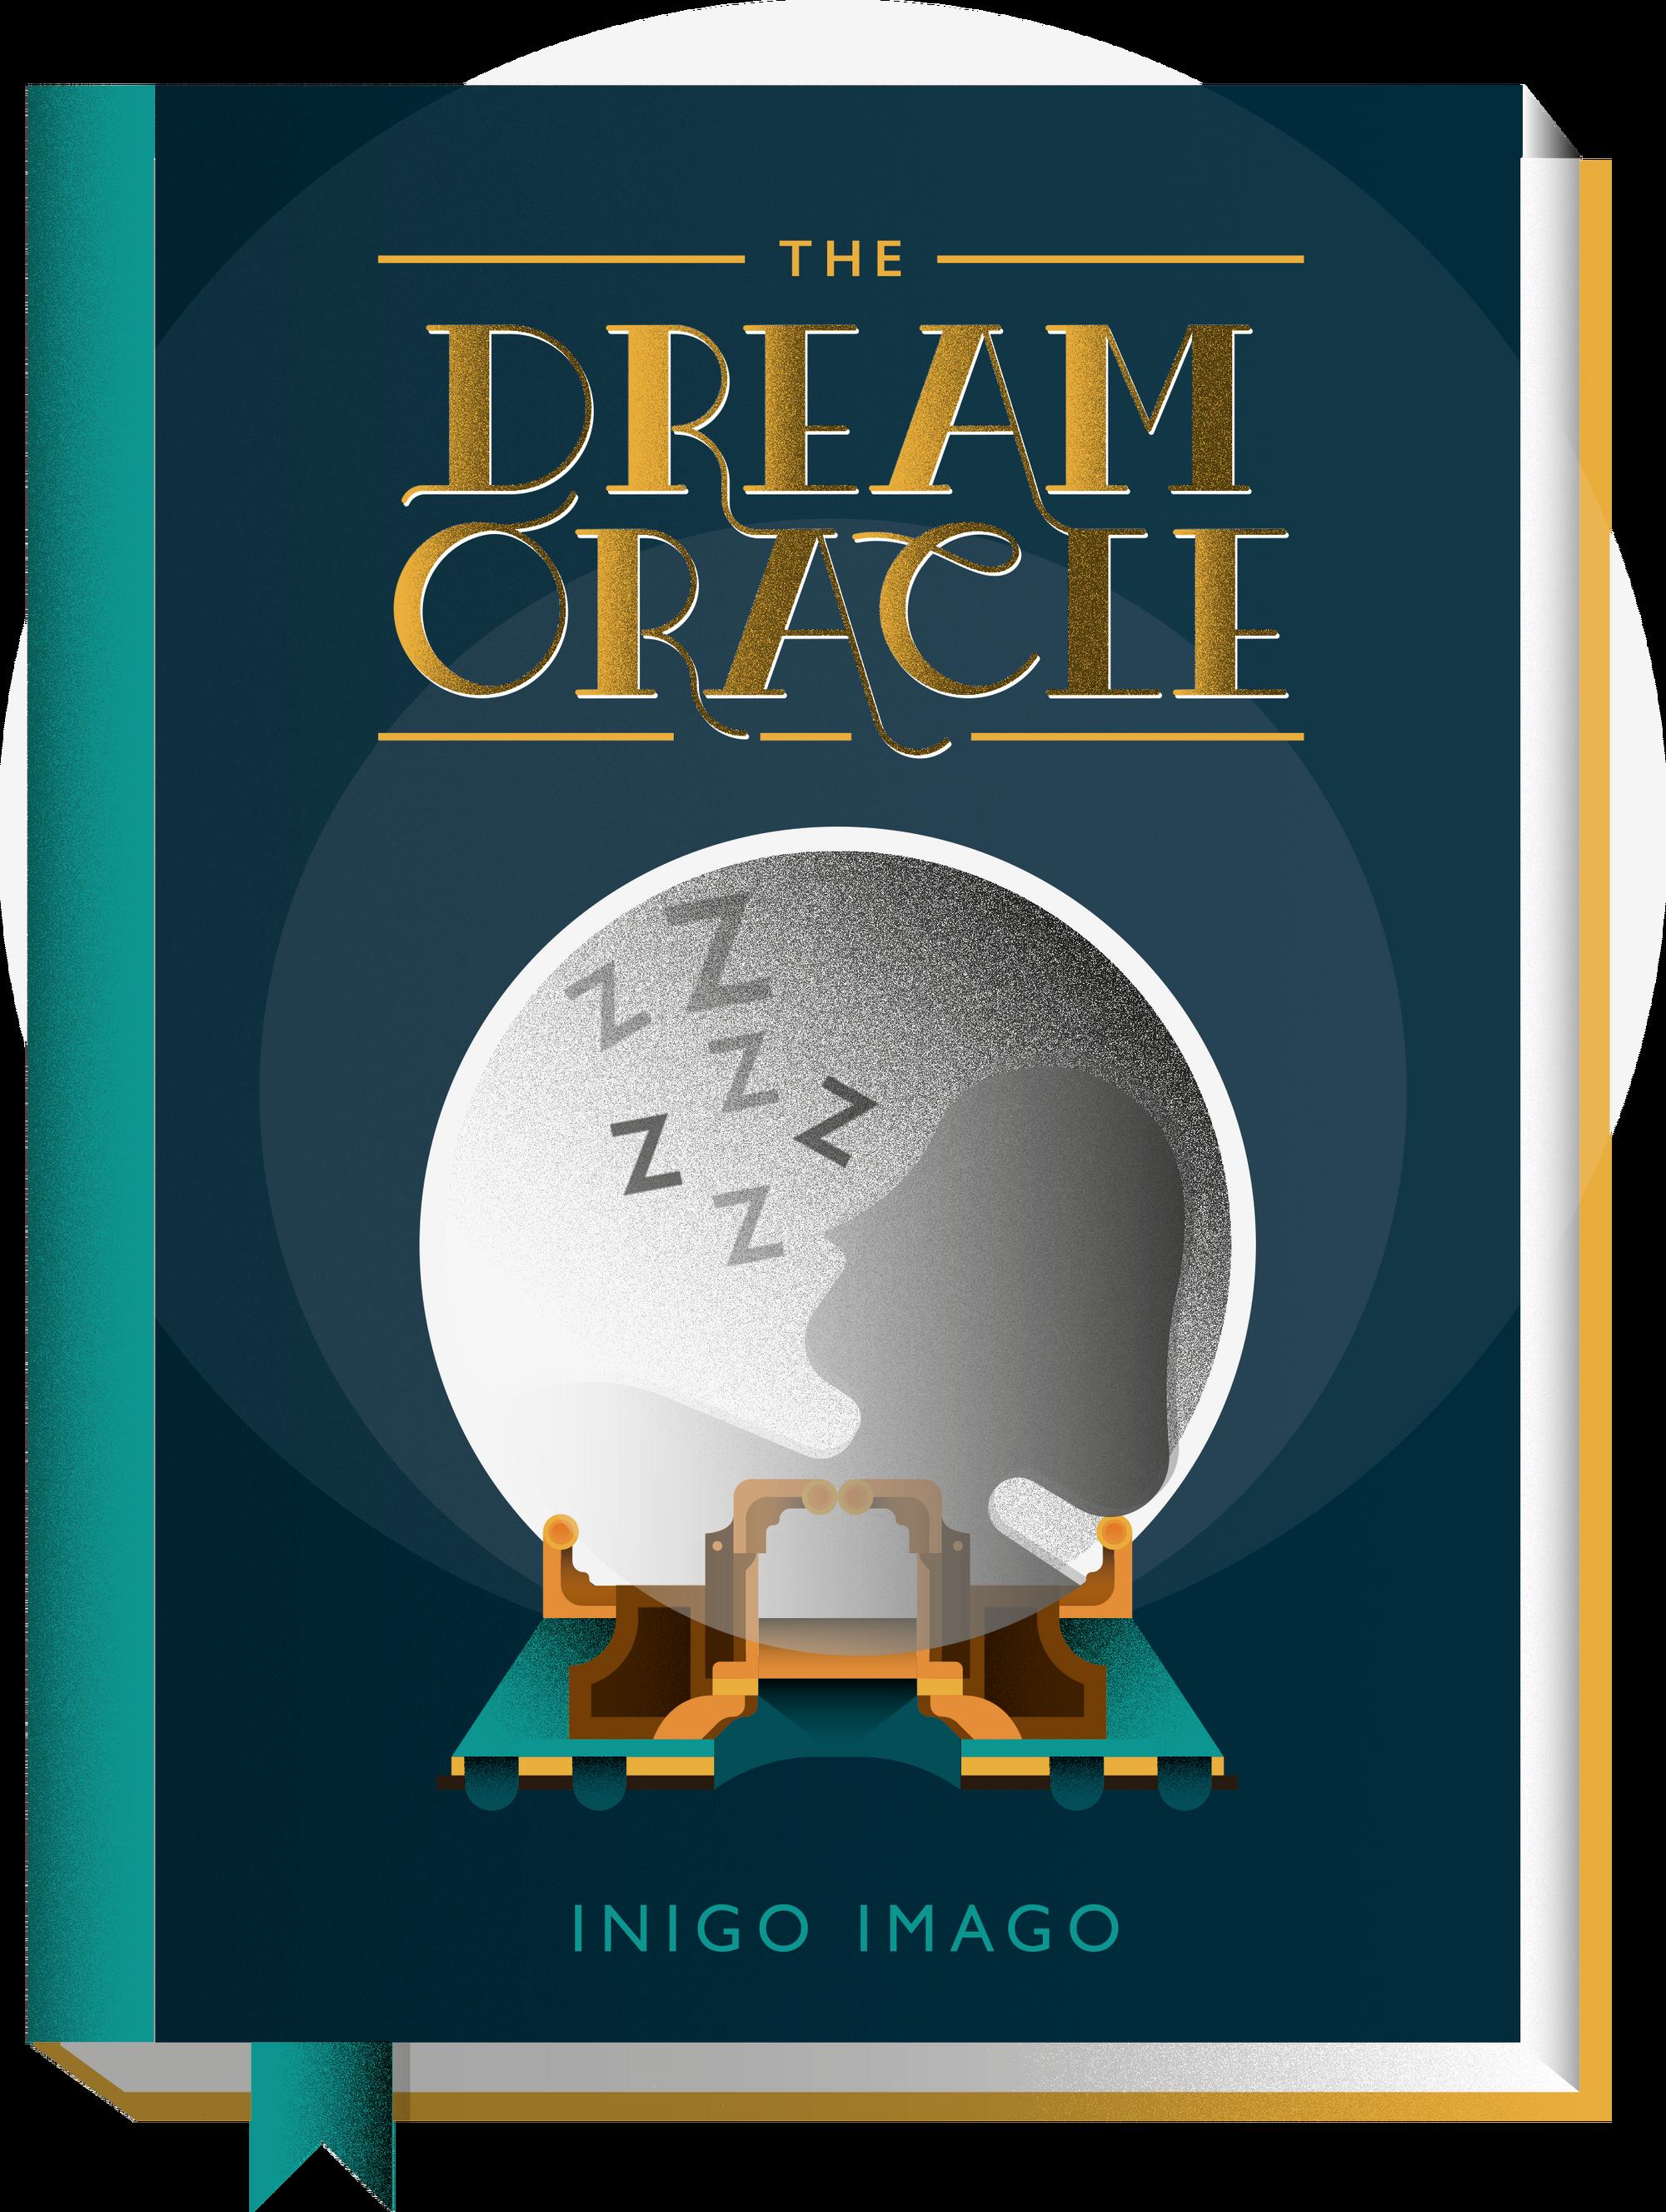 Dream interpretation Crouch, what dreams dream Crouch in a dream to see 30